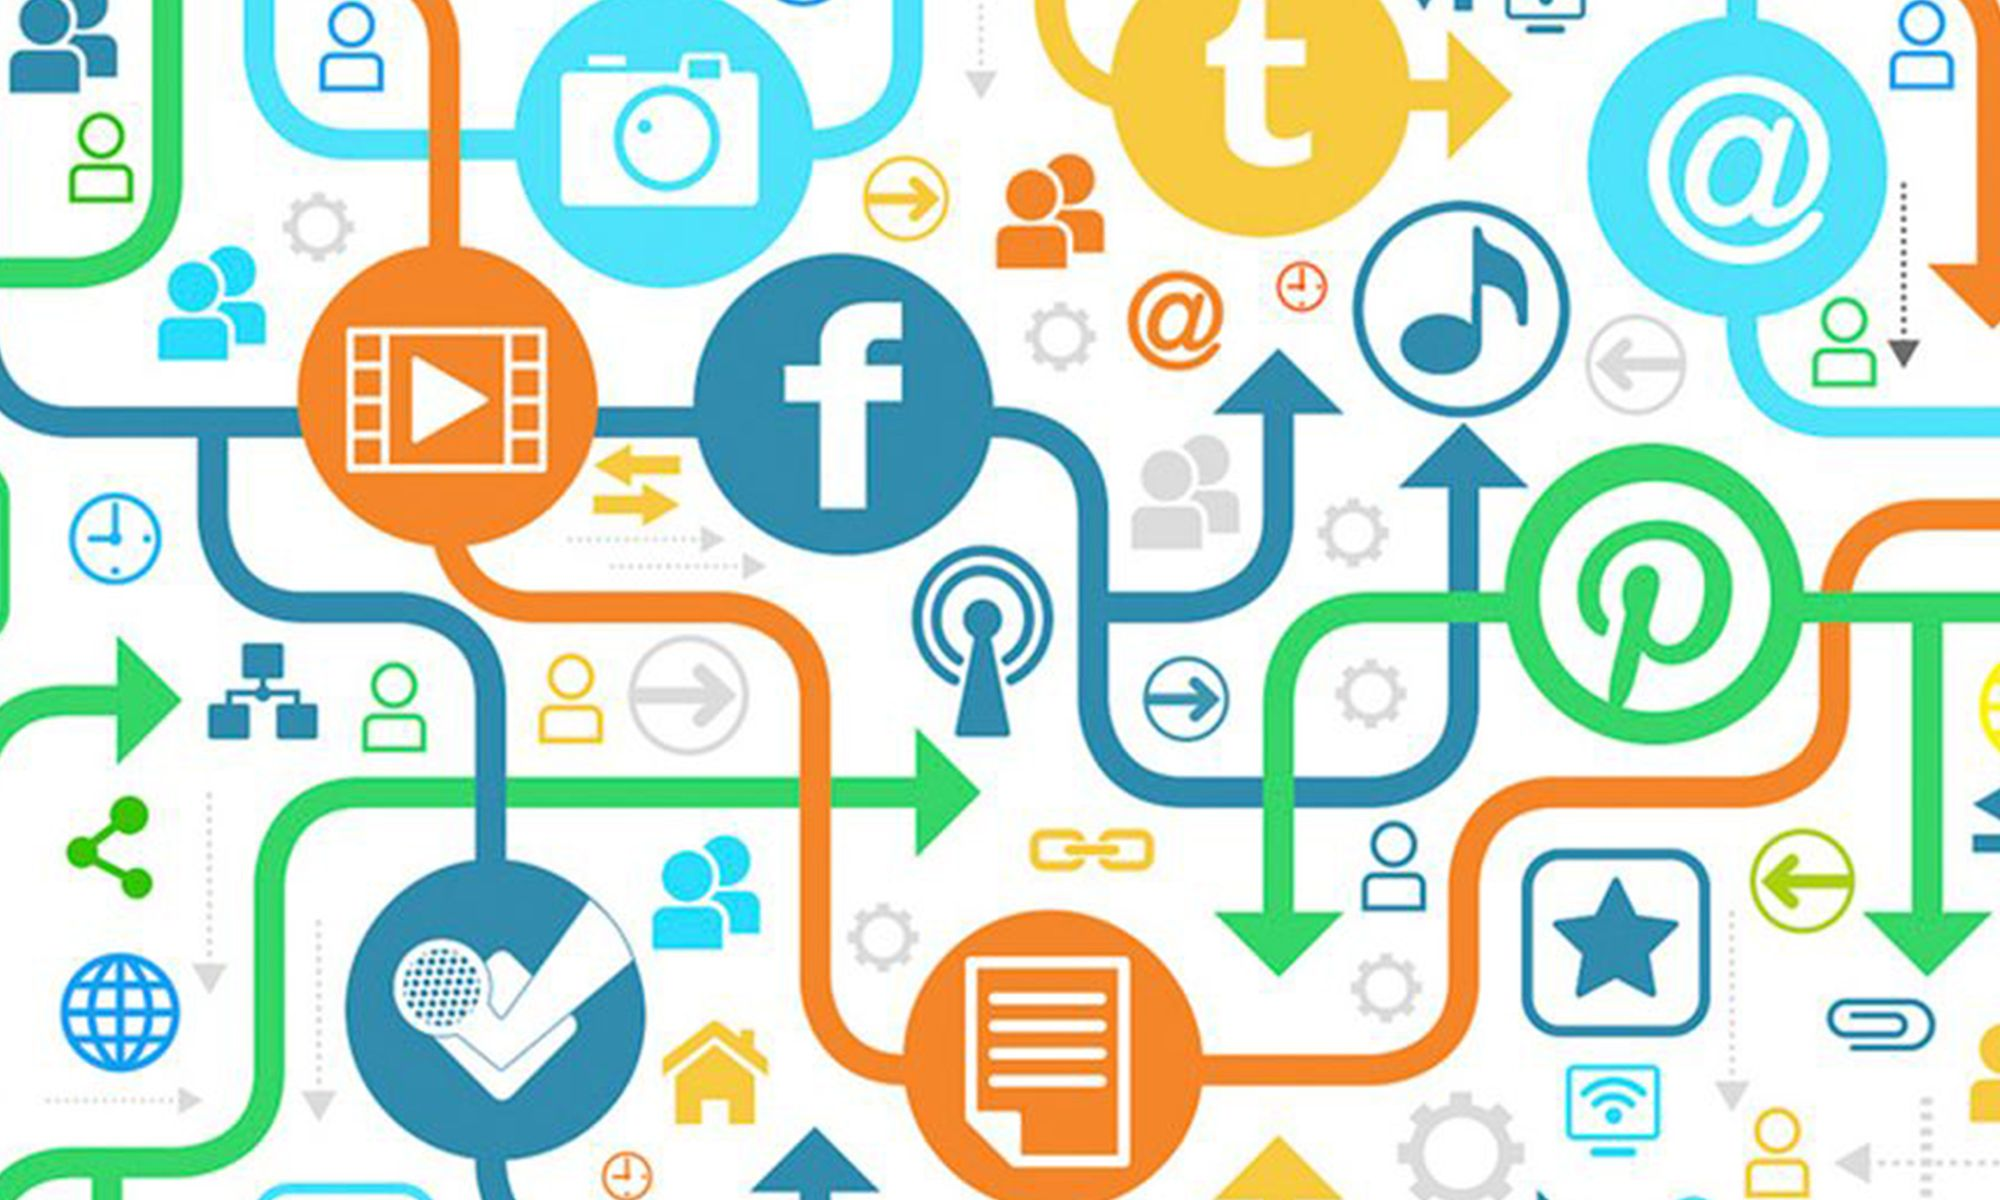 Hospitality Key trends: The Digital Transformation